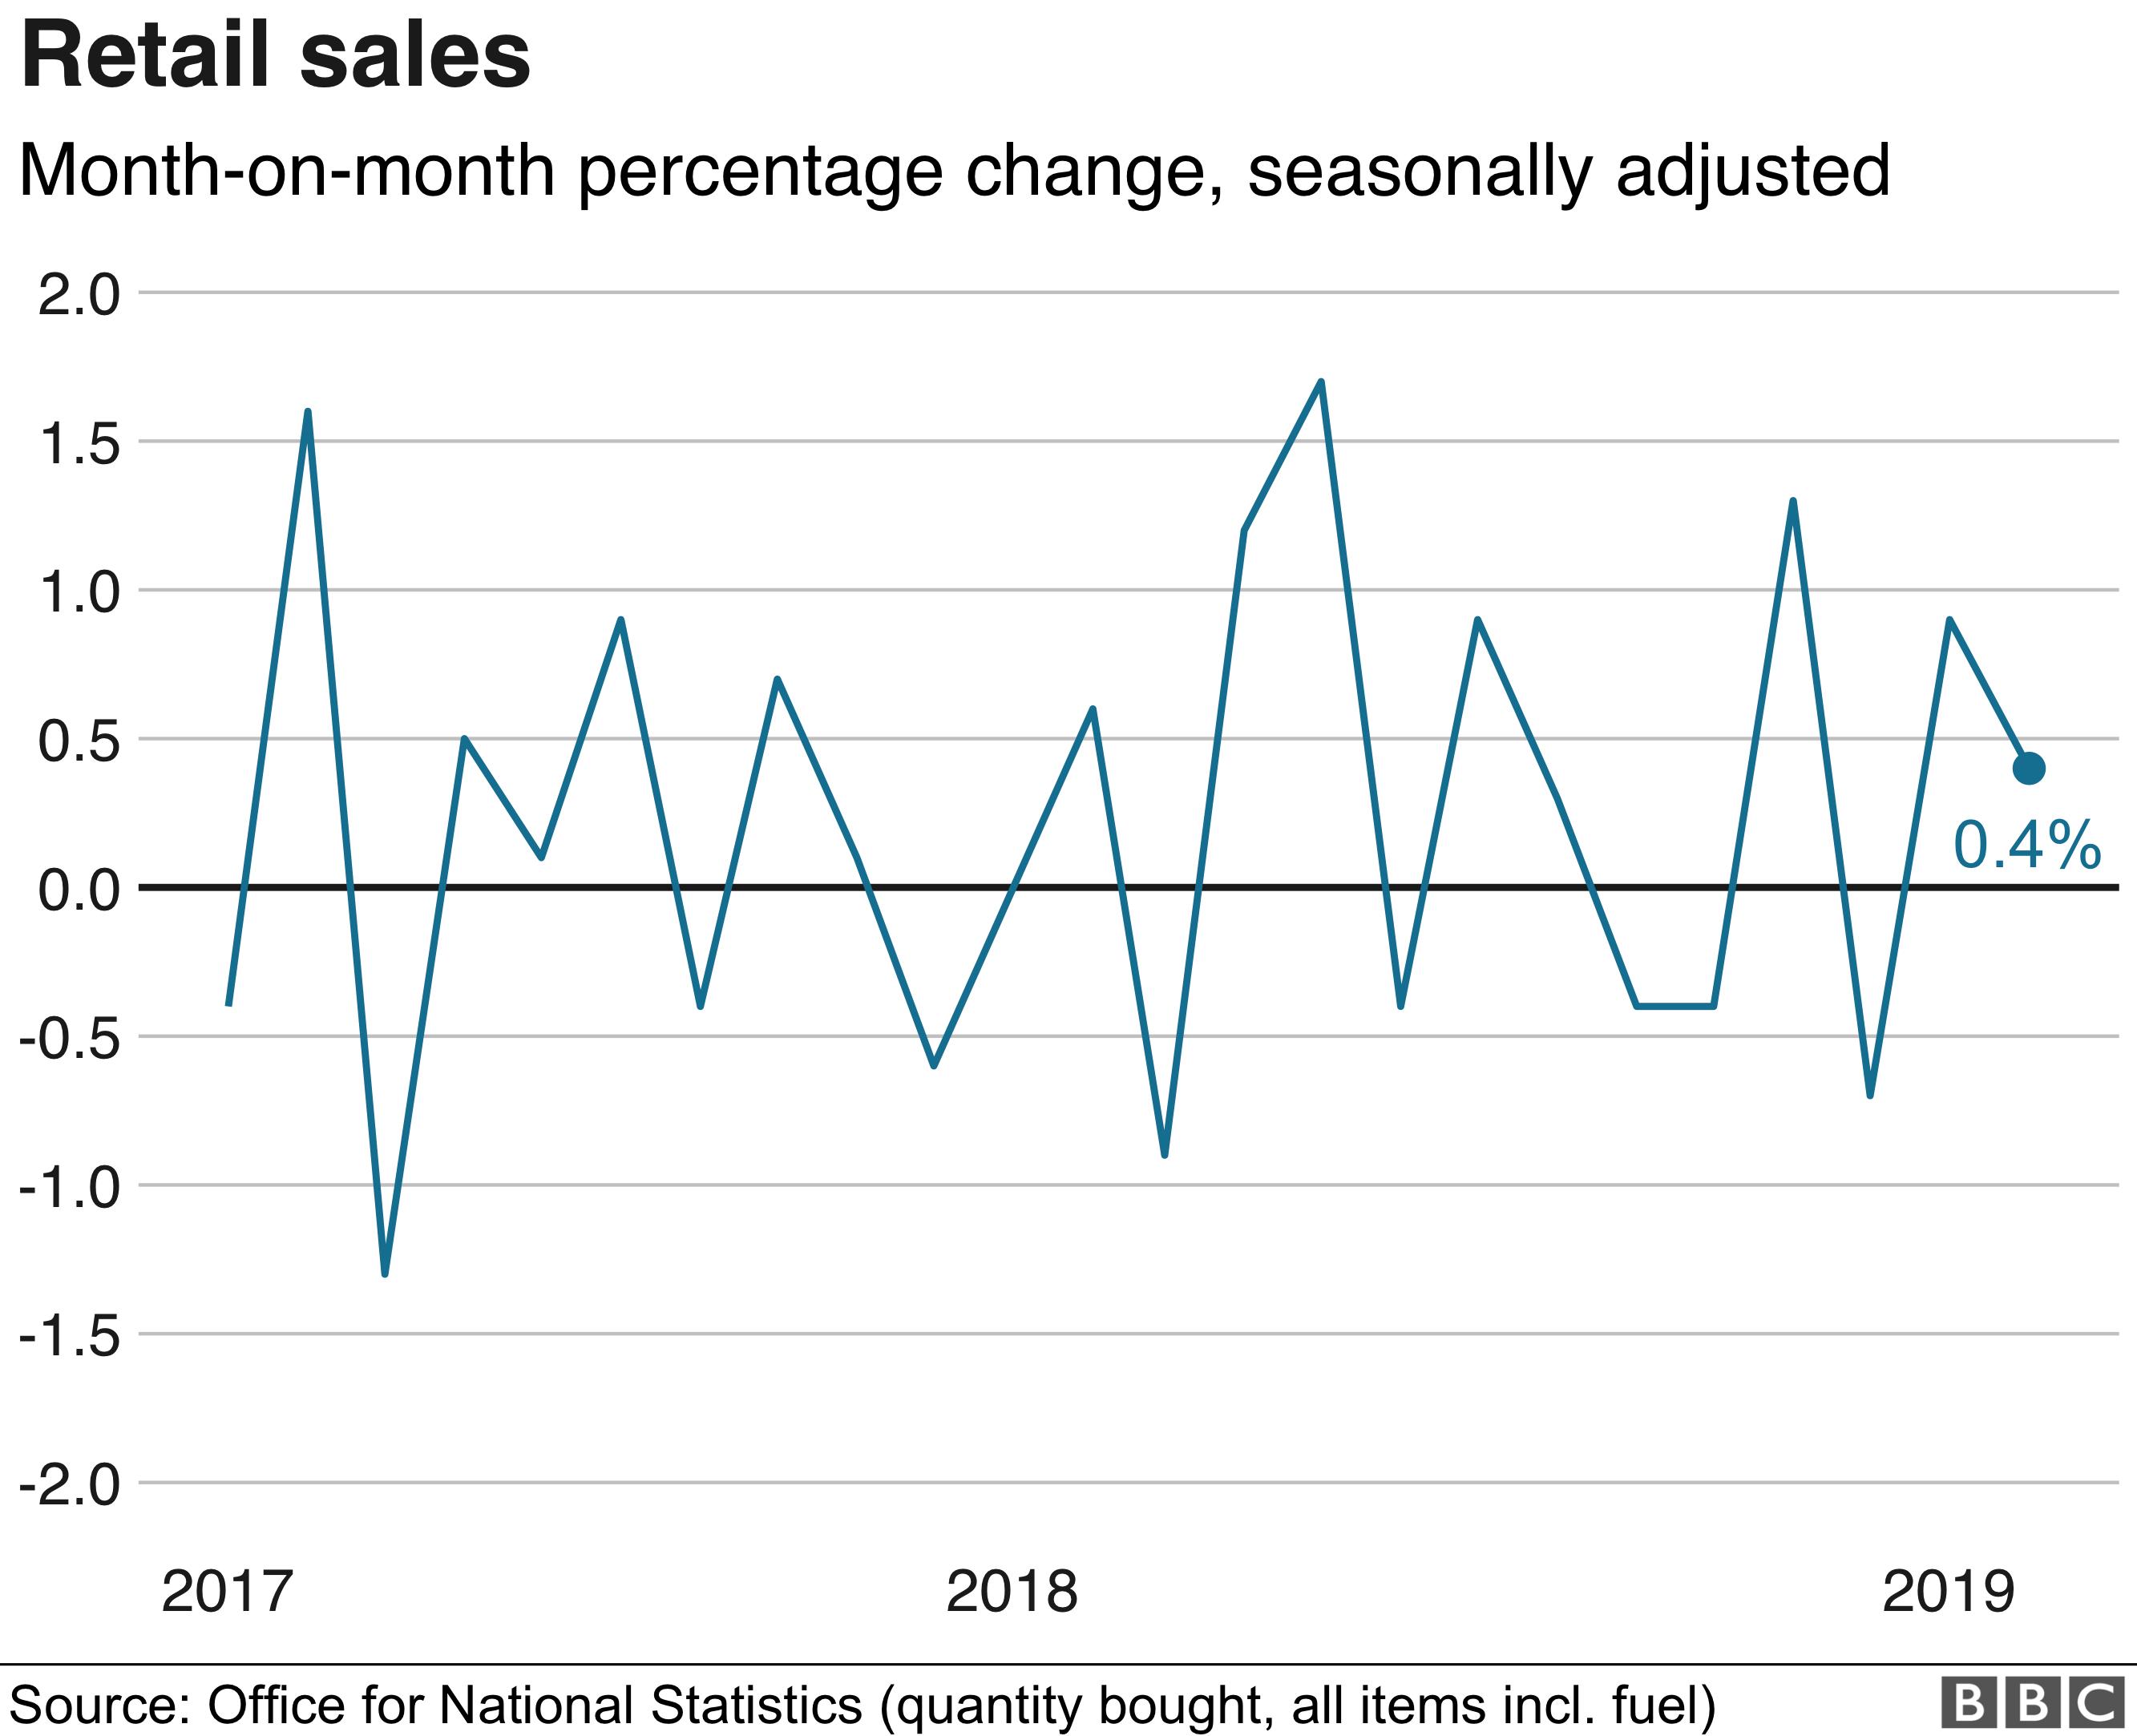 UK retail sales up but food spending falls - BBC News